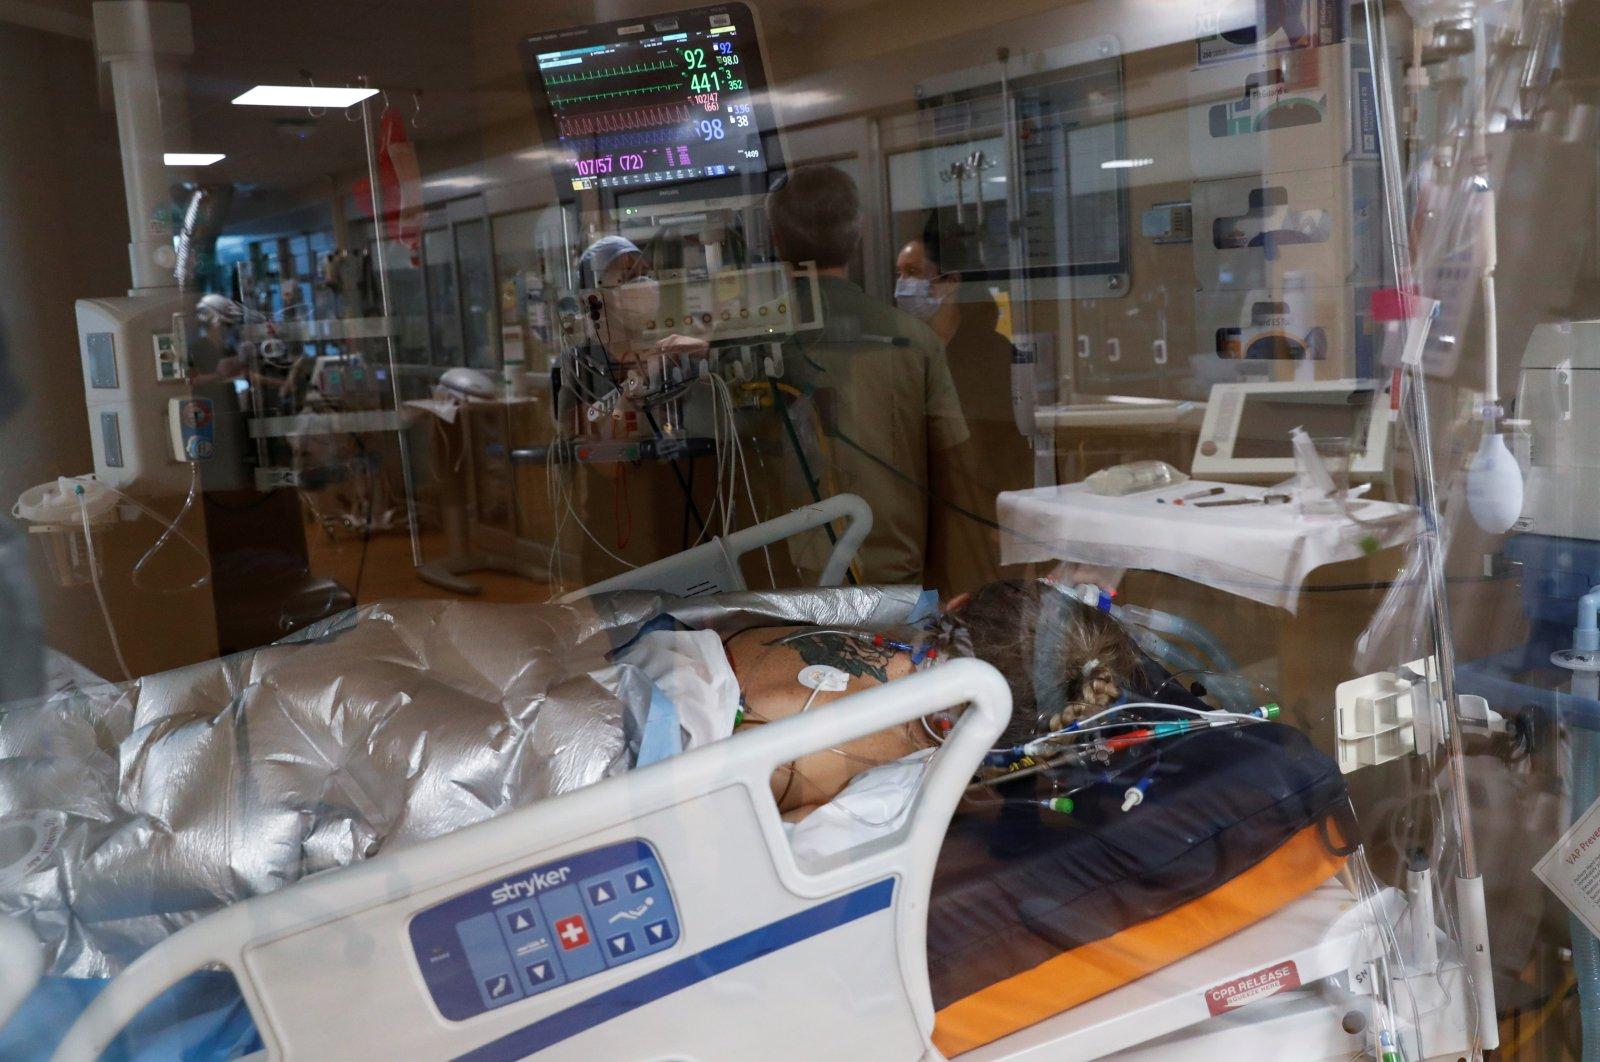 A coronavirus patient lies on a bed in the intensive care unit (ICU) at Sarasota Memorial Hospital in Sarasota, Florida, U.S. Feb. 11, 2021. (Reuters Photo)